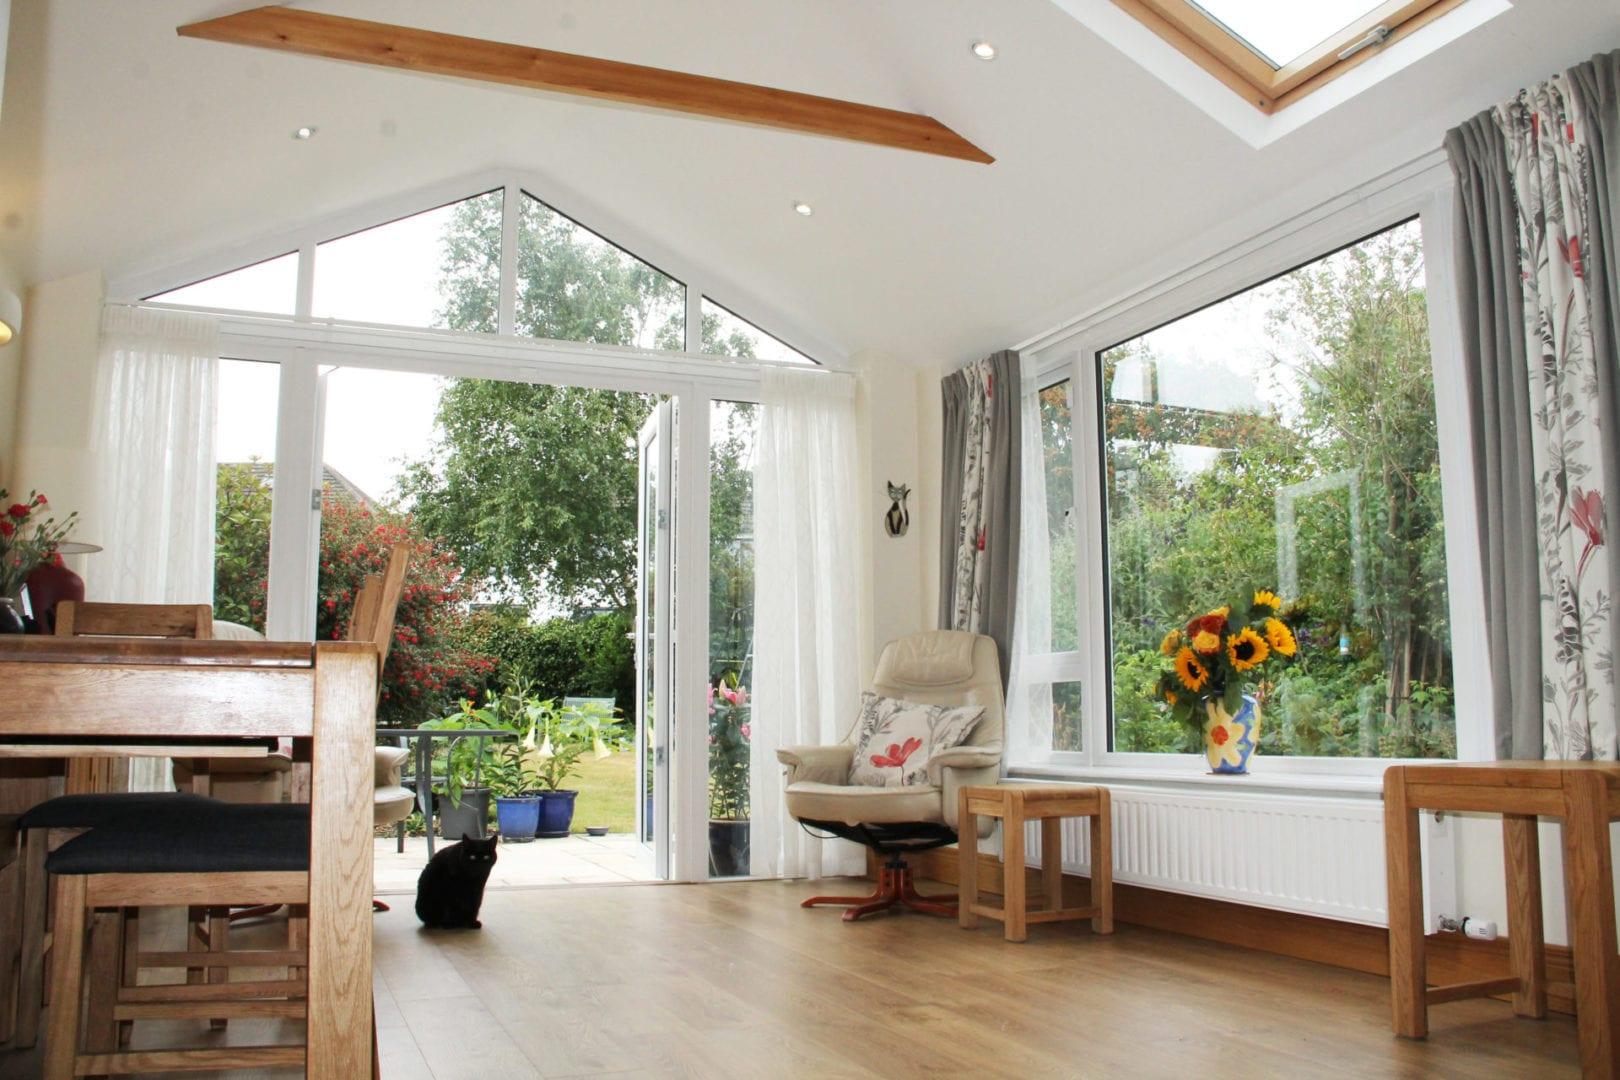 Gable Front Sunroom With Pillars Internal